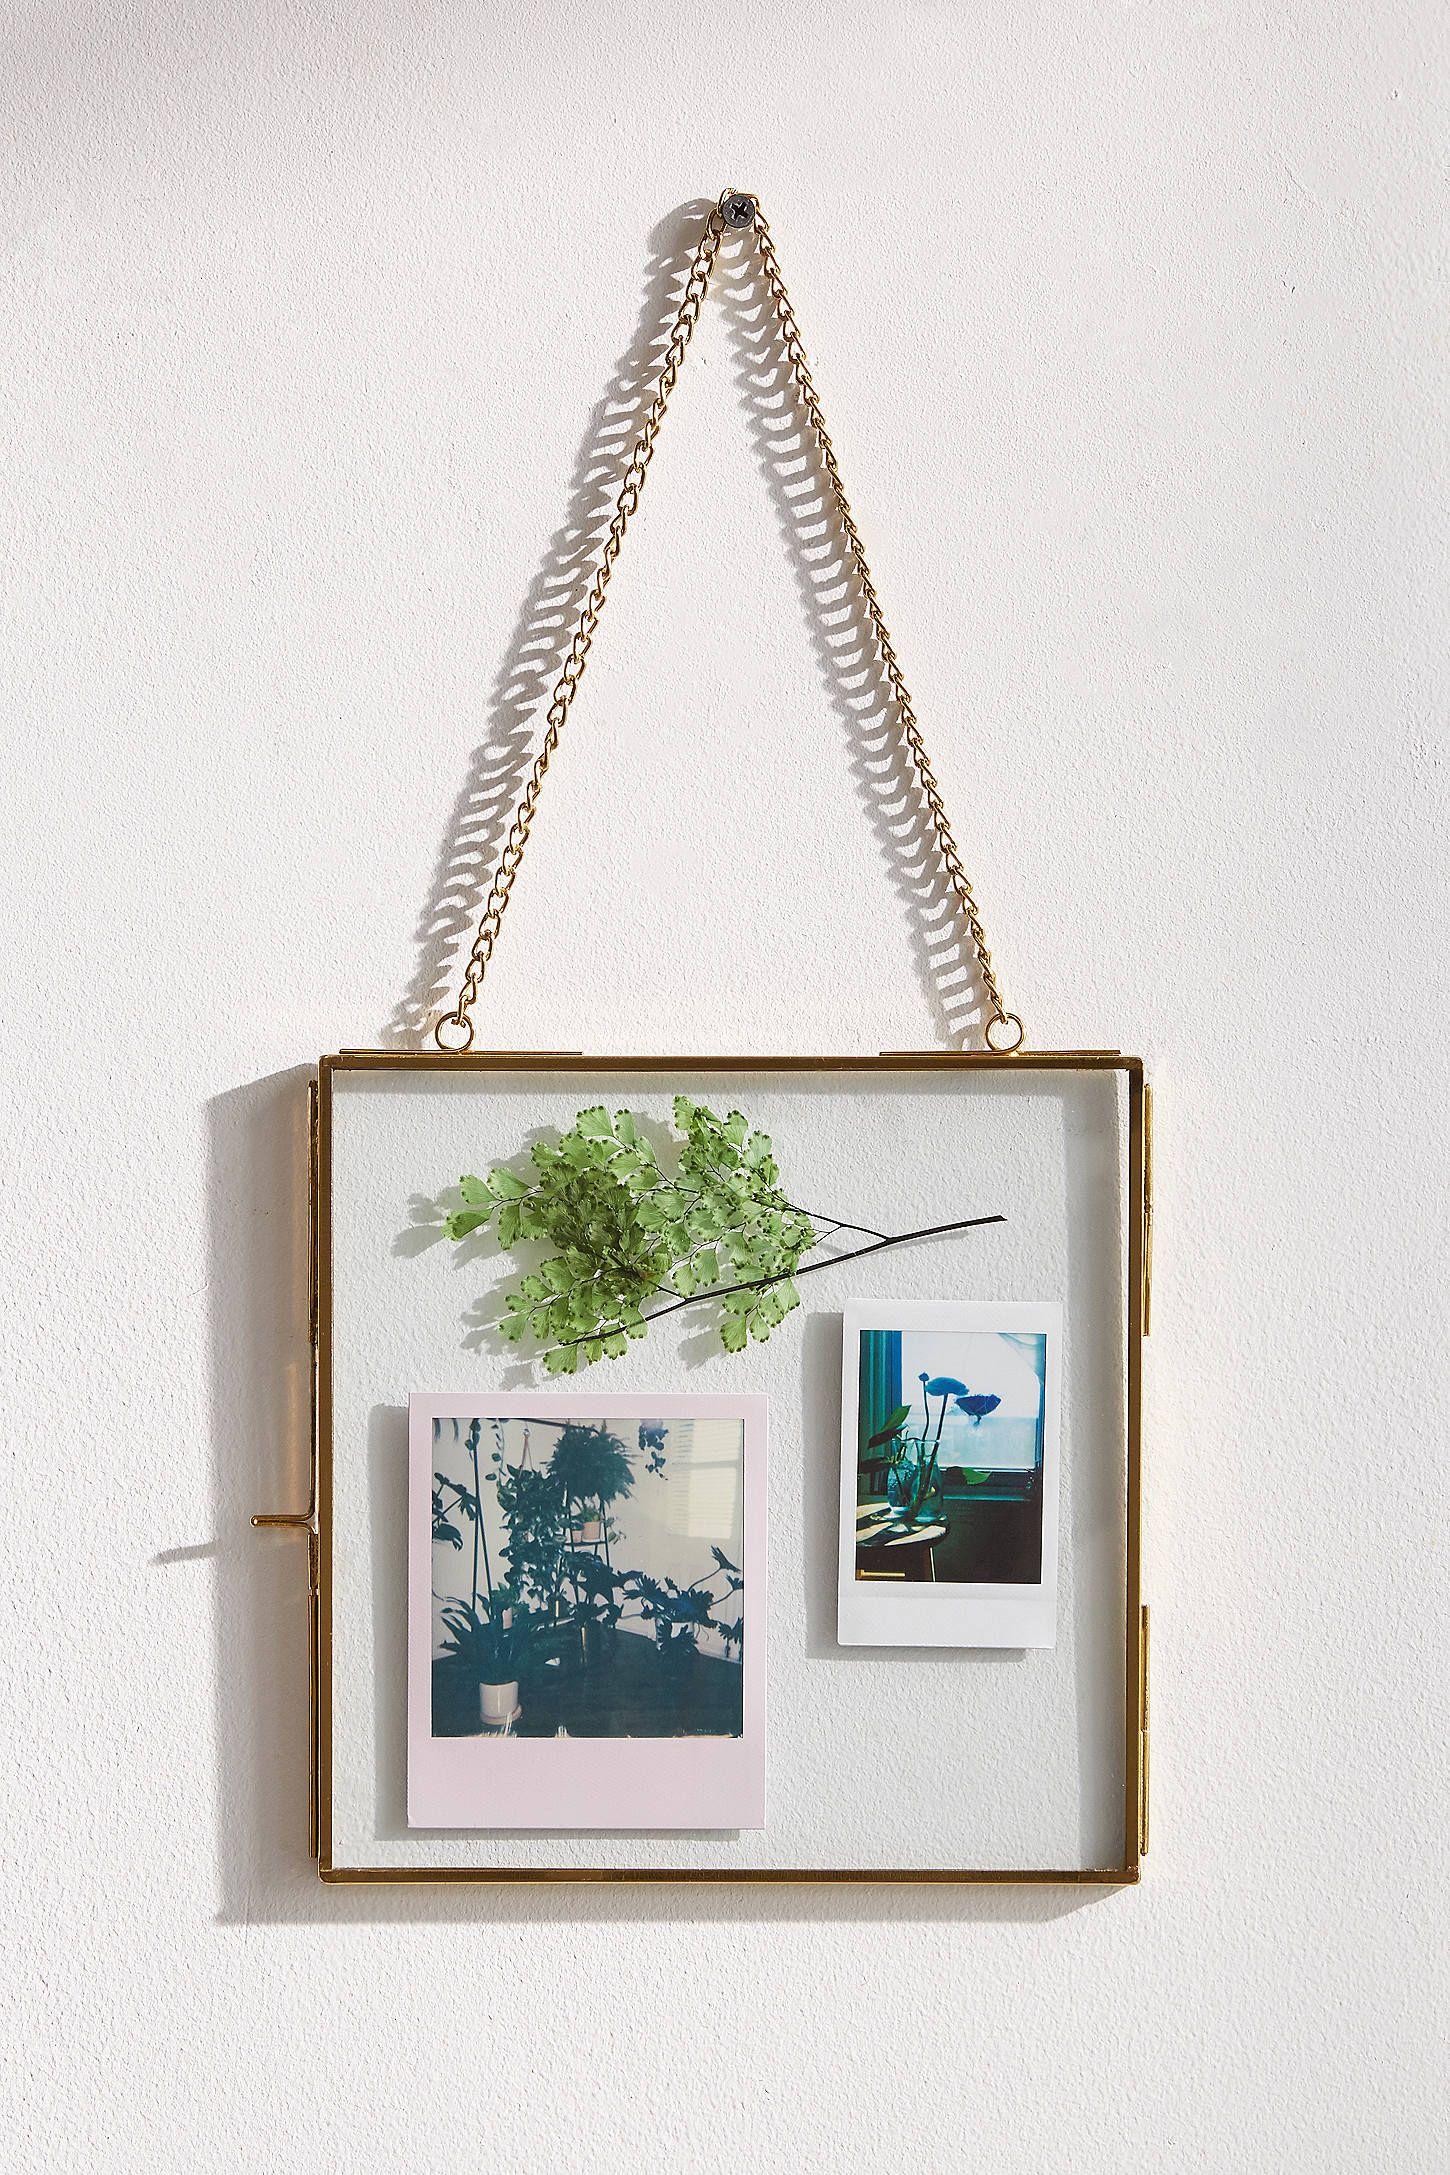 Hanging Glass Display Frame - 8x8 | Pinterest | Display, Mtv cribs ...